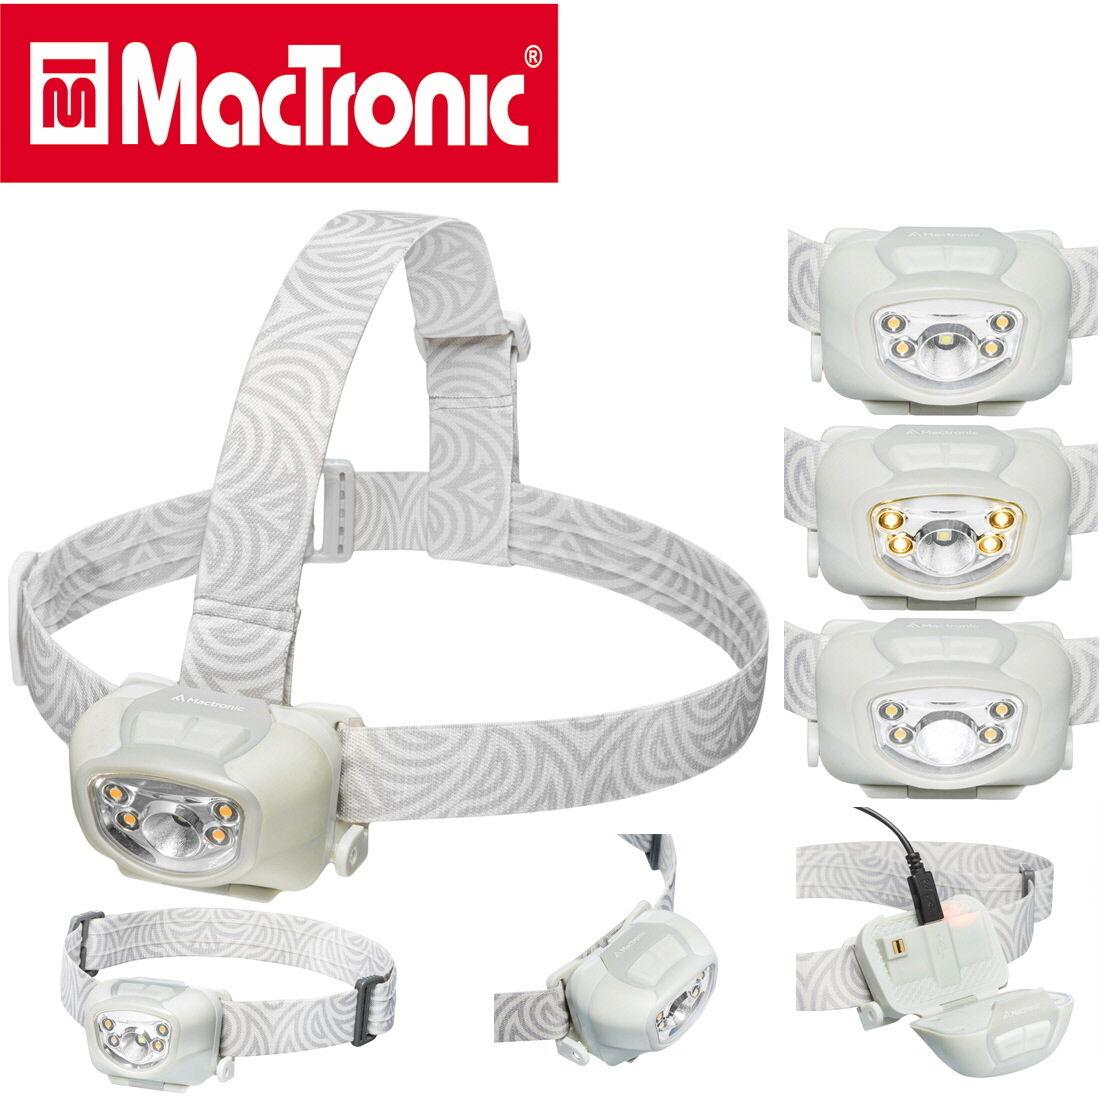 Mactronic Stirnlampe Nippo 1.9 LED Campinglampe Leuchte Kopflampe AHL0013